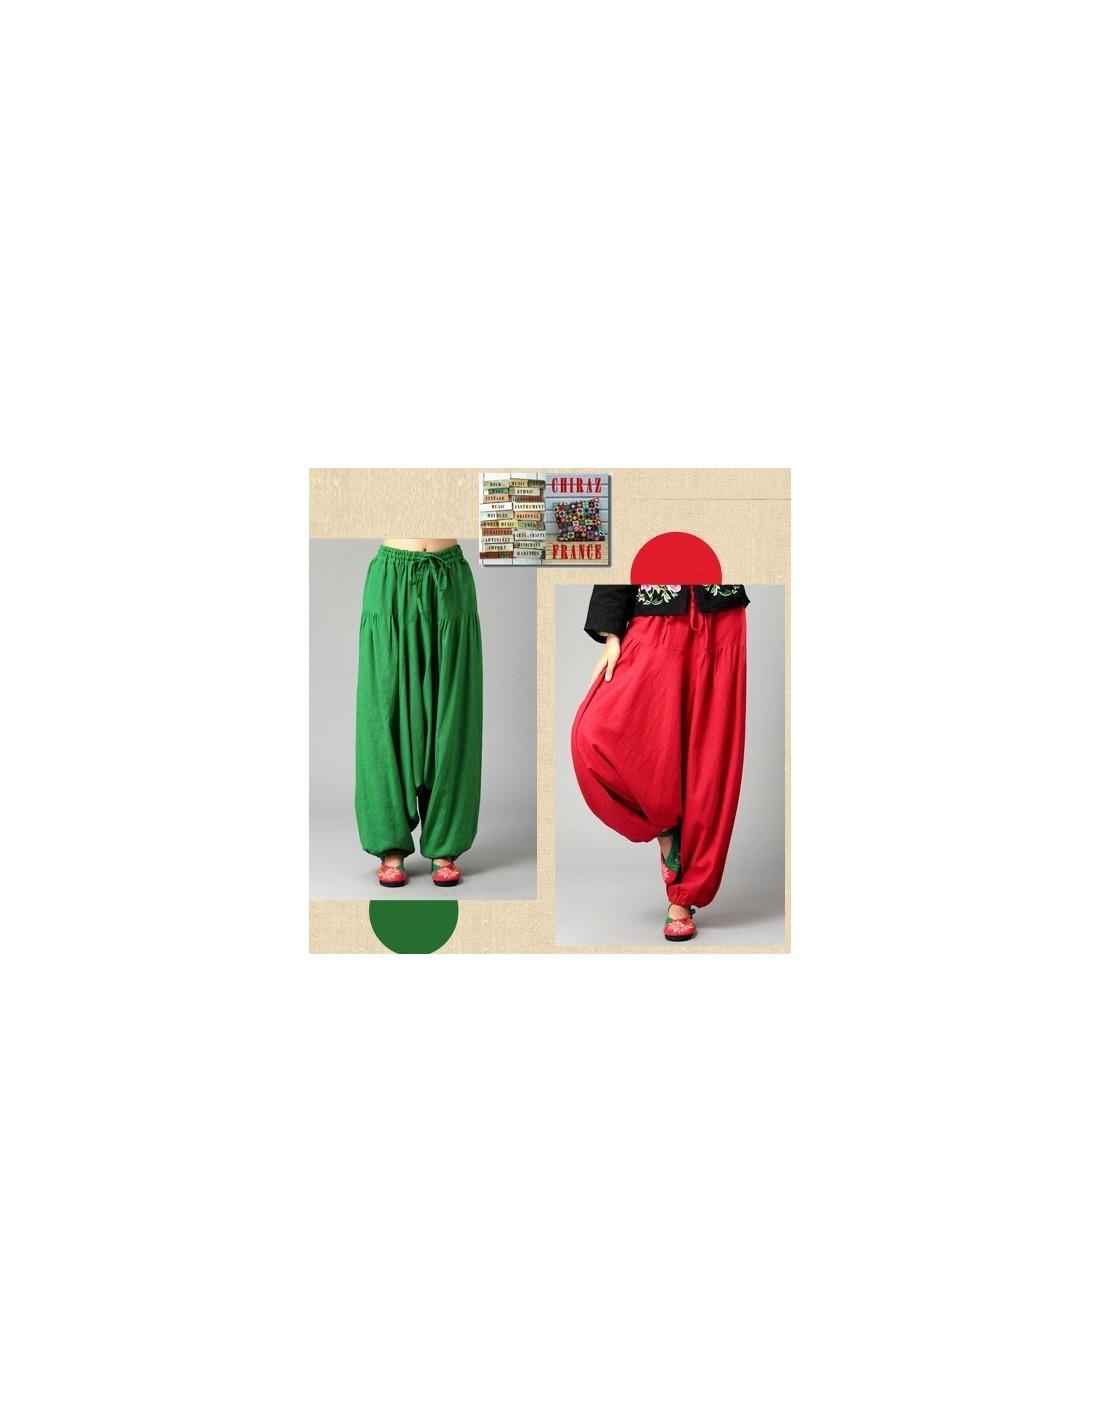 Pantalon large sarouel VERT LIN samouraï yoga boho ethnique folk